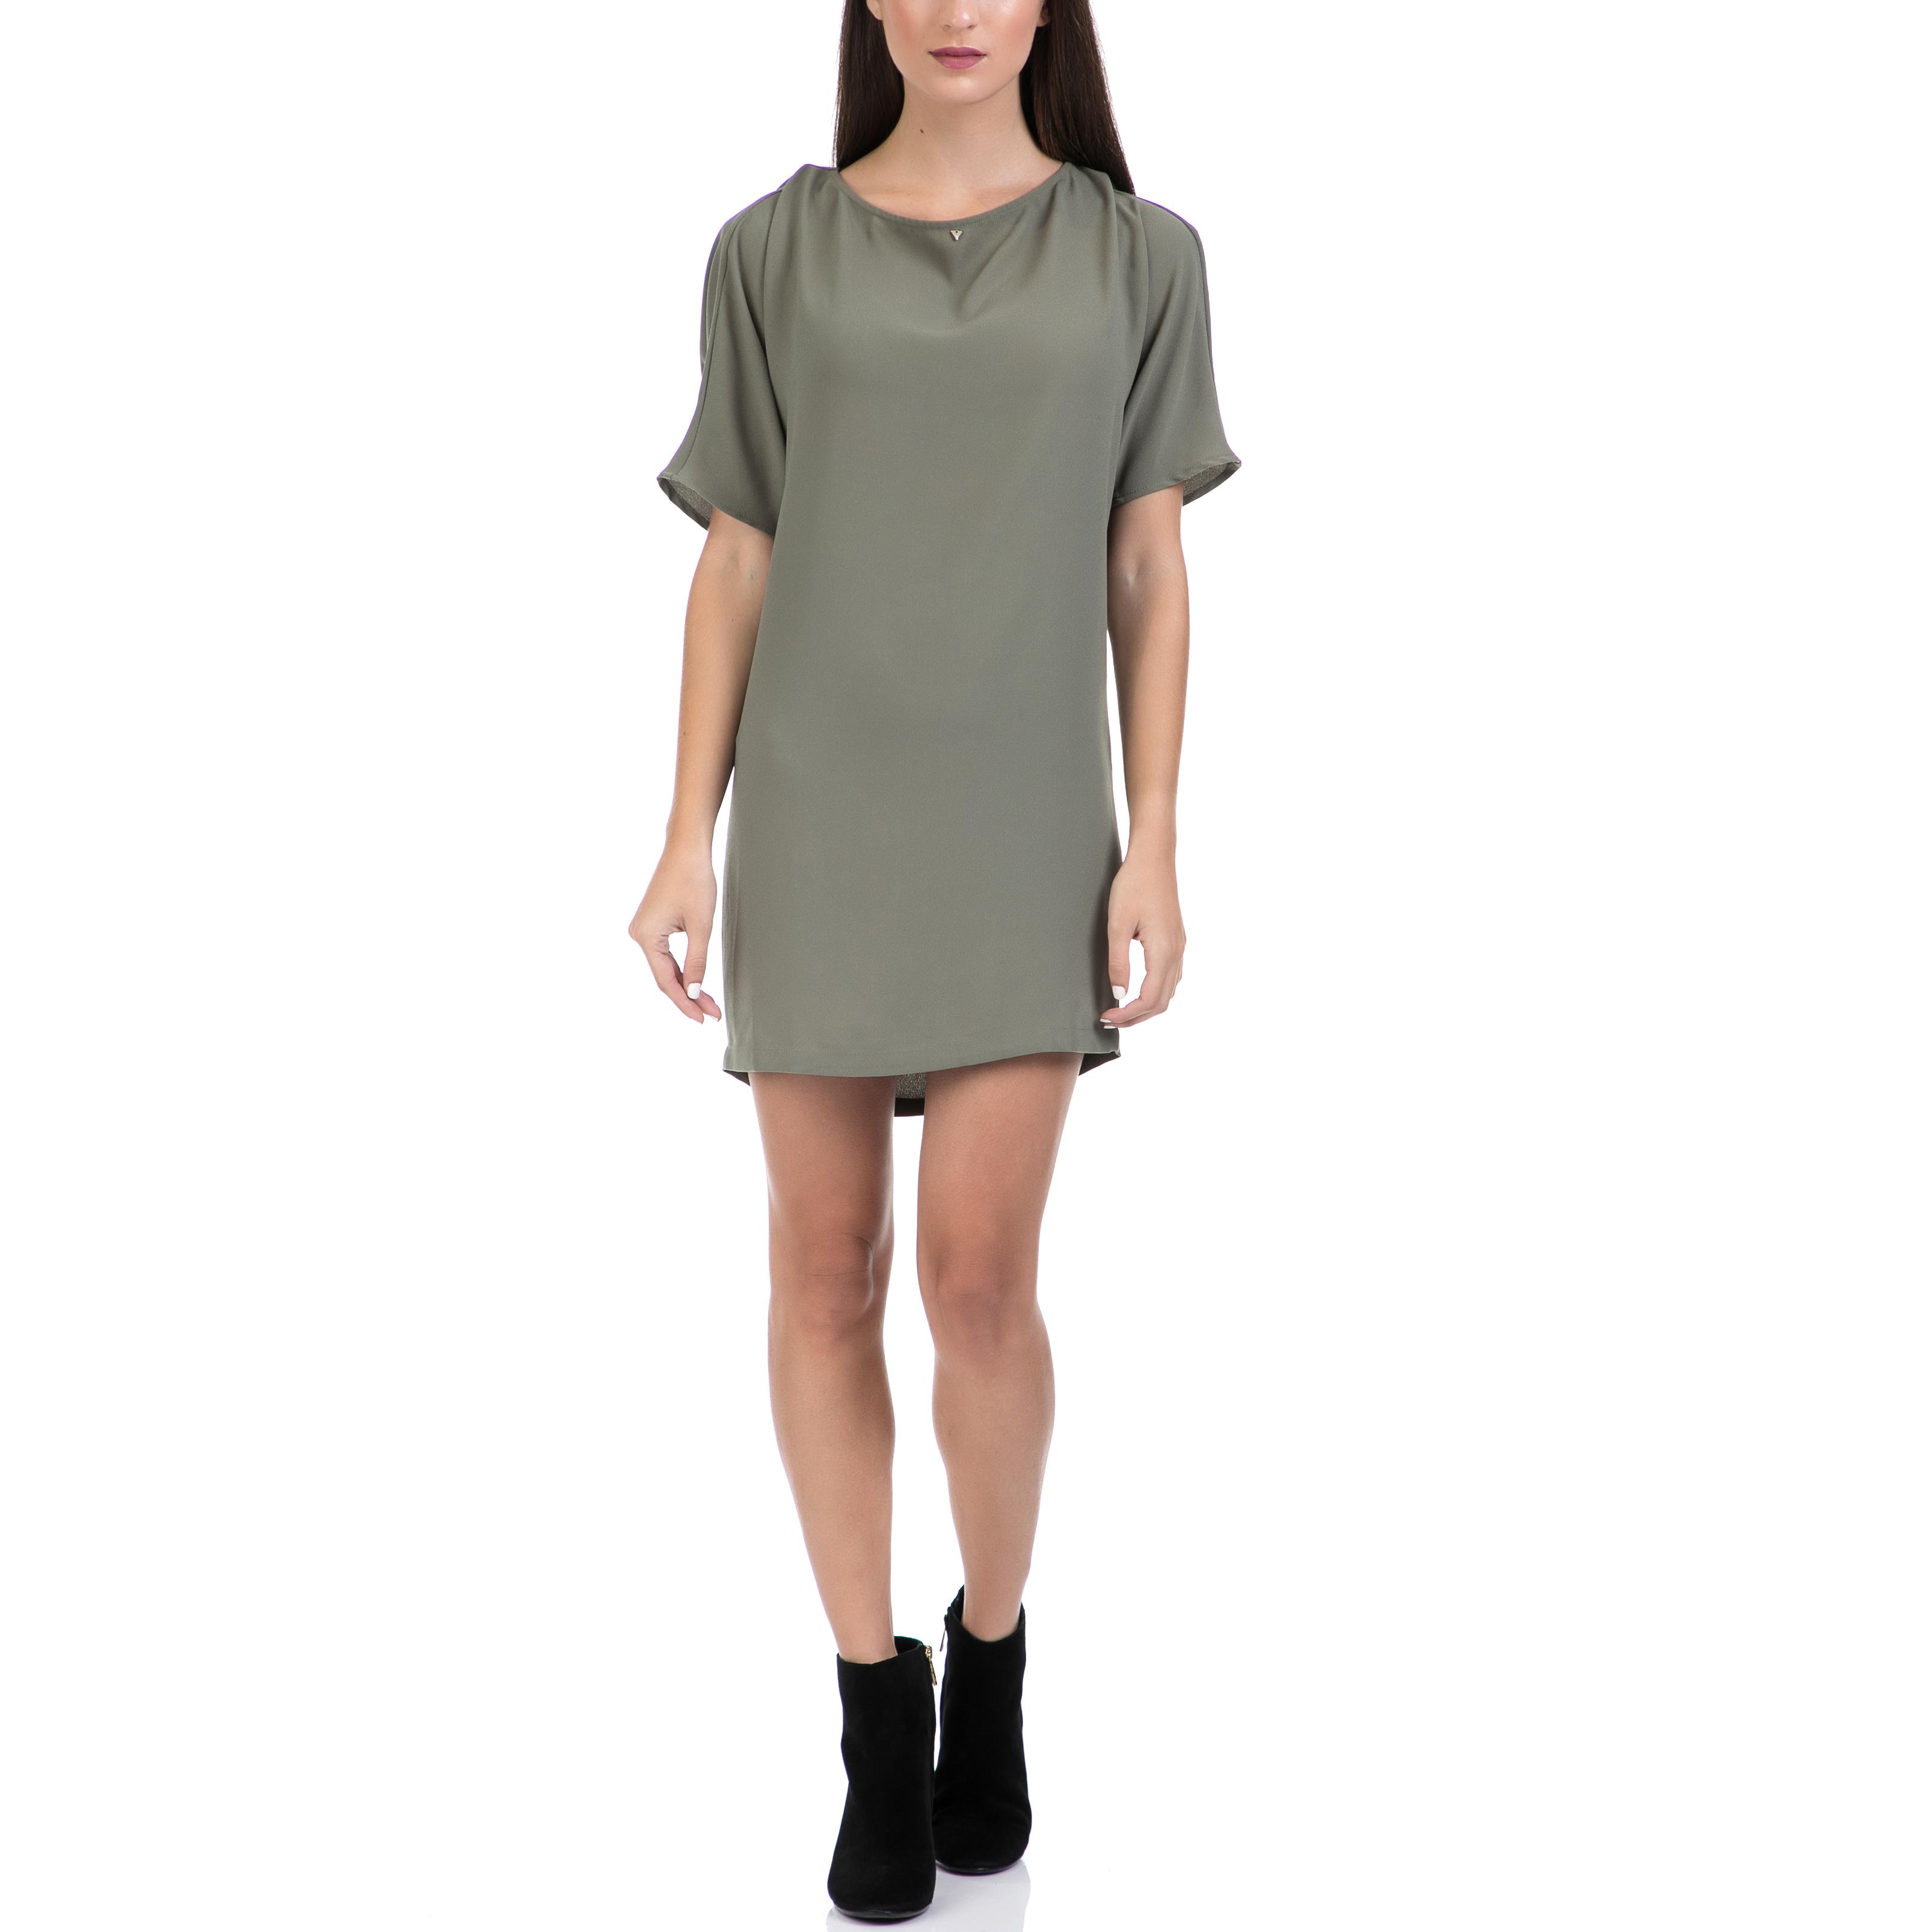 GUESS - Γυναικείο φόρεμα GUESS λαδί γυναικεία ρούχα φορέματα μίνι